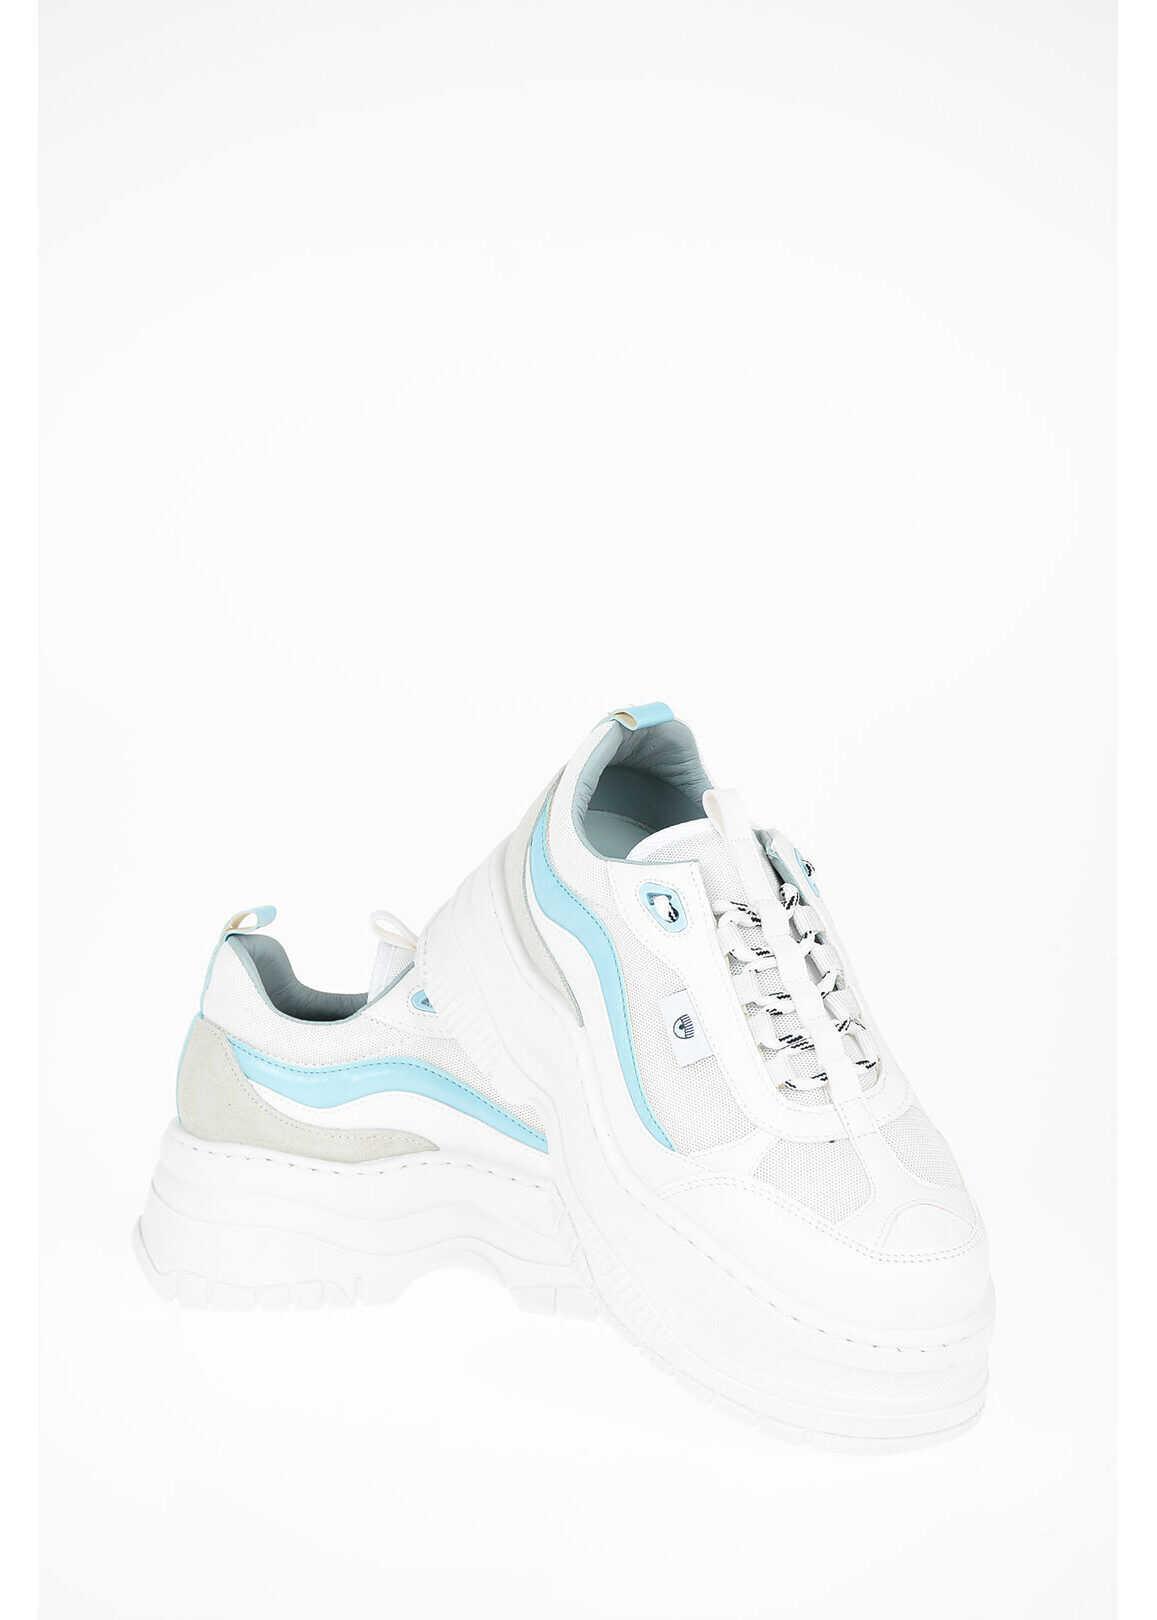 Chiara Ferragni Chunky Sneakers with Tank Sole LIGHT BLUE